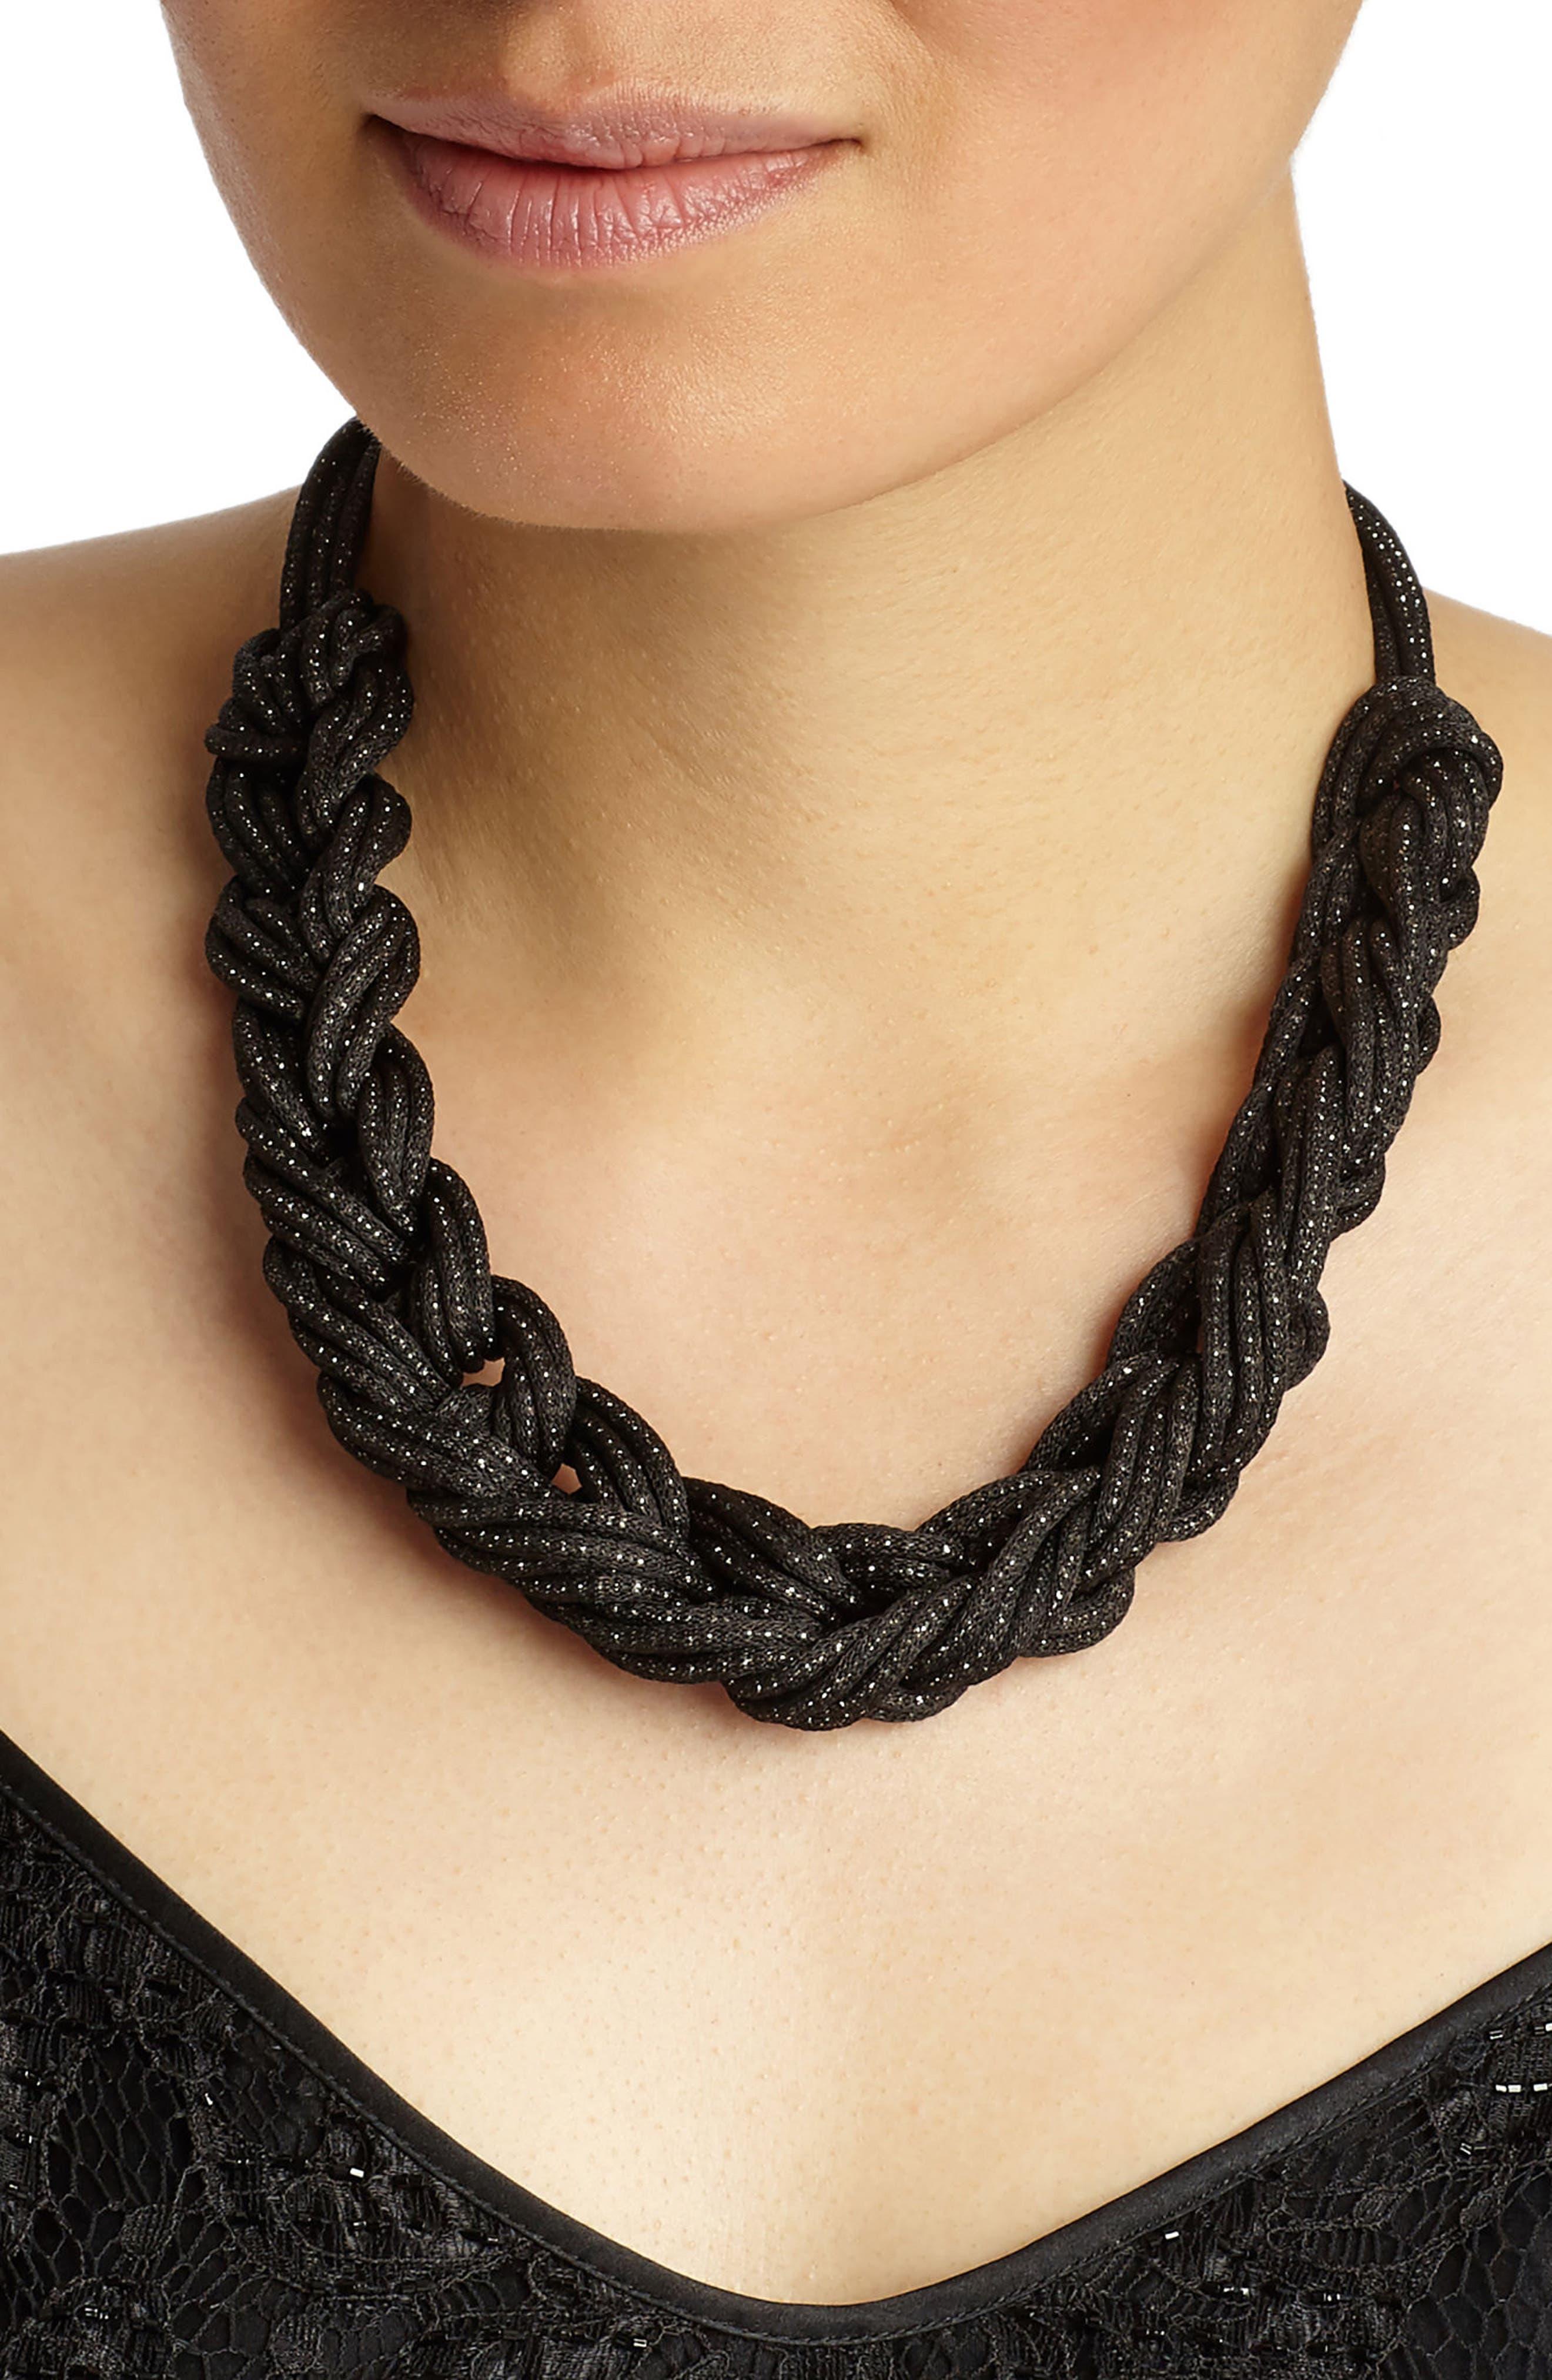 Braided Mesh Necklace,                             Alternate thumbnail 2, color,                             Black